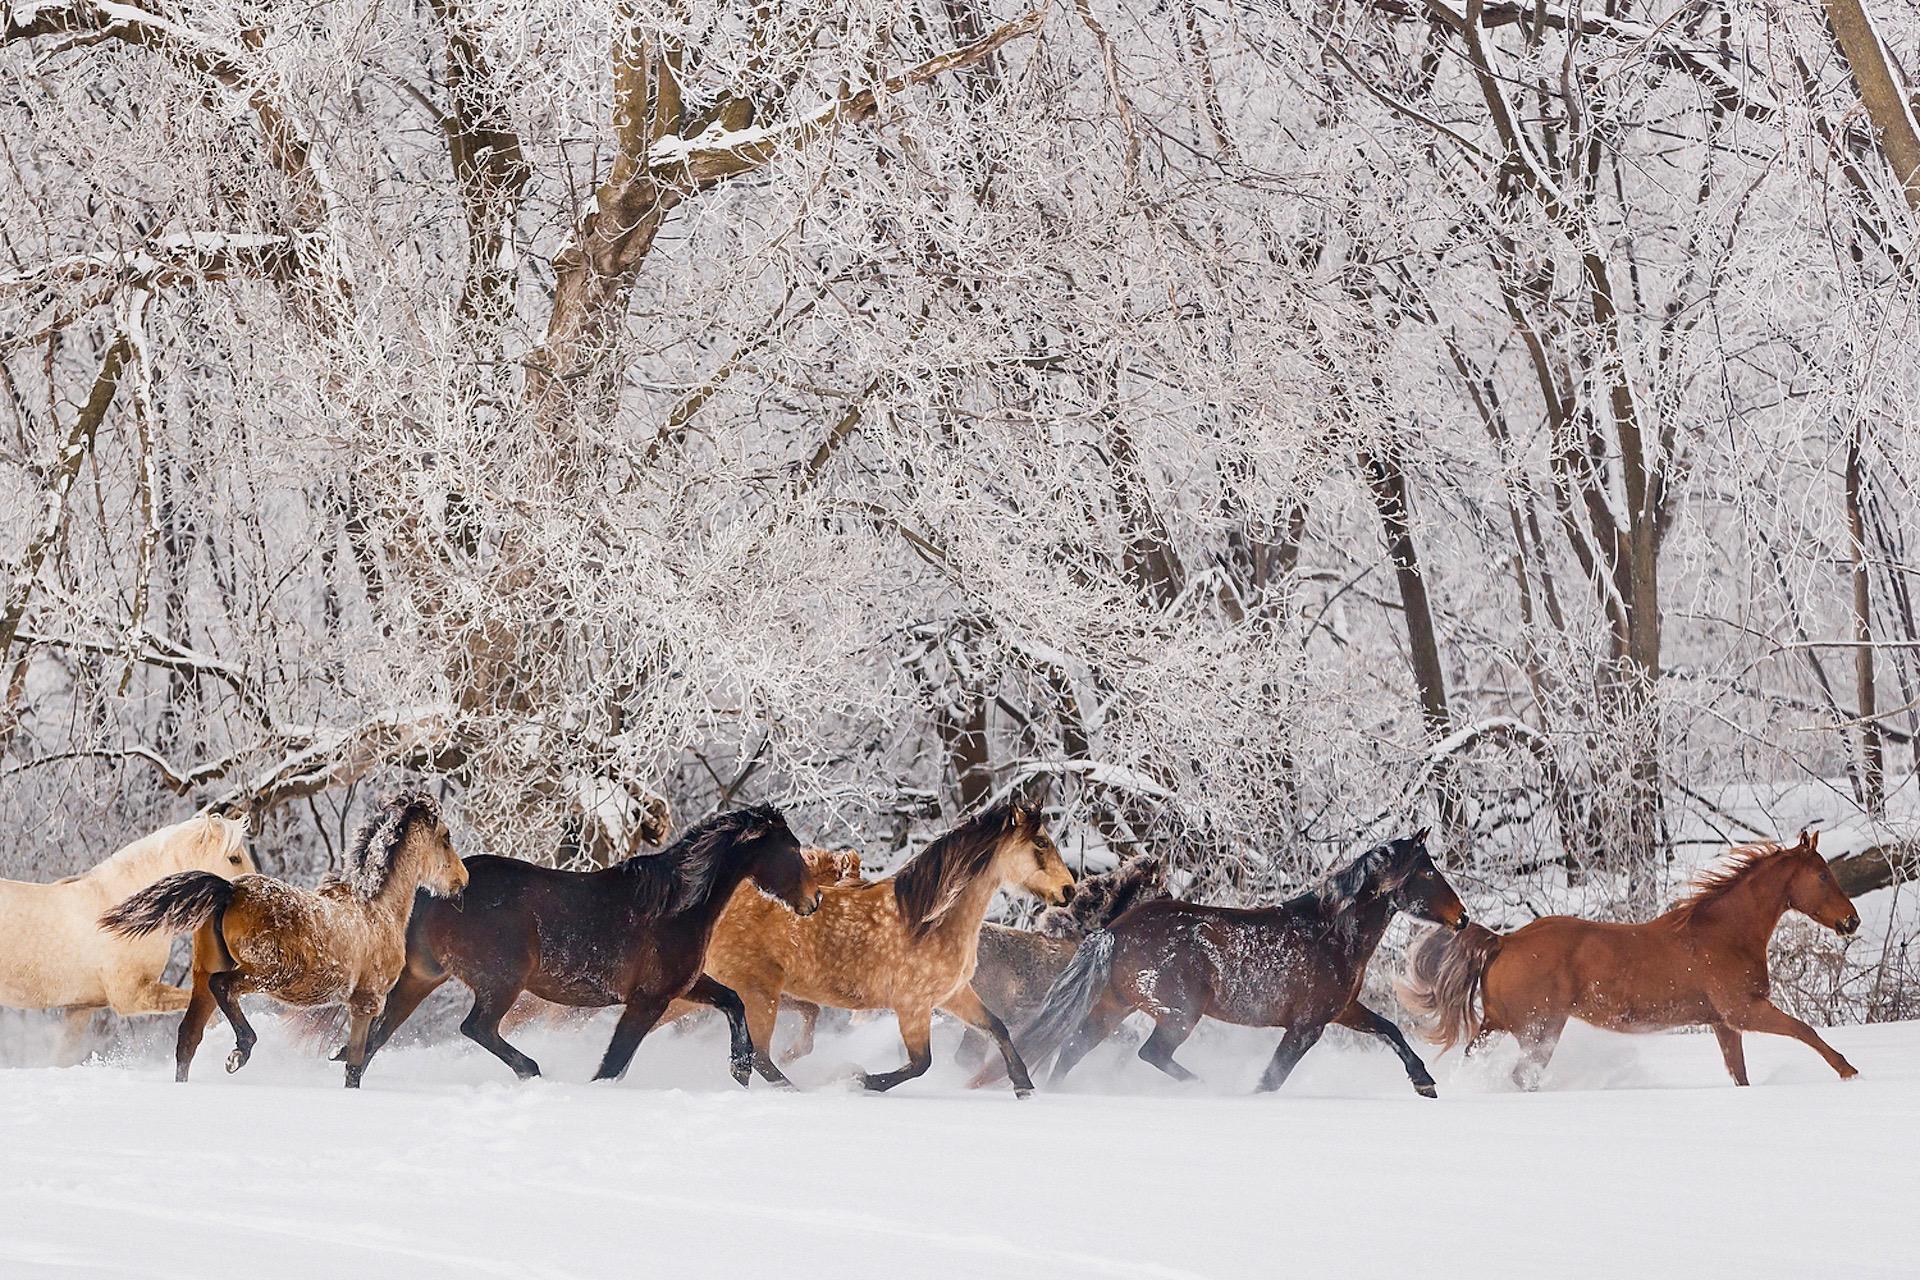 Catching a Runaway Horse